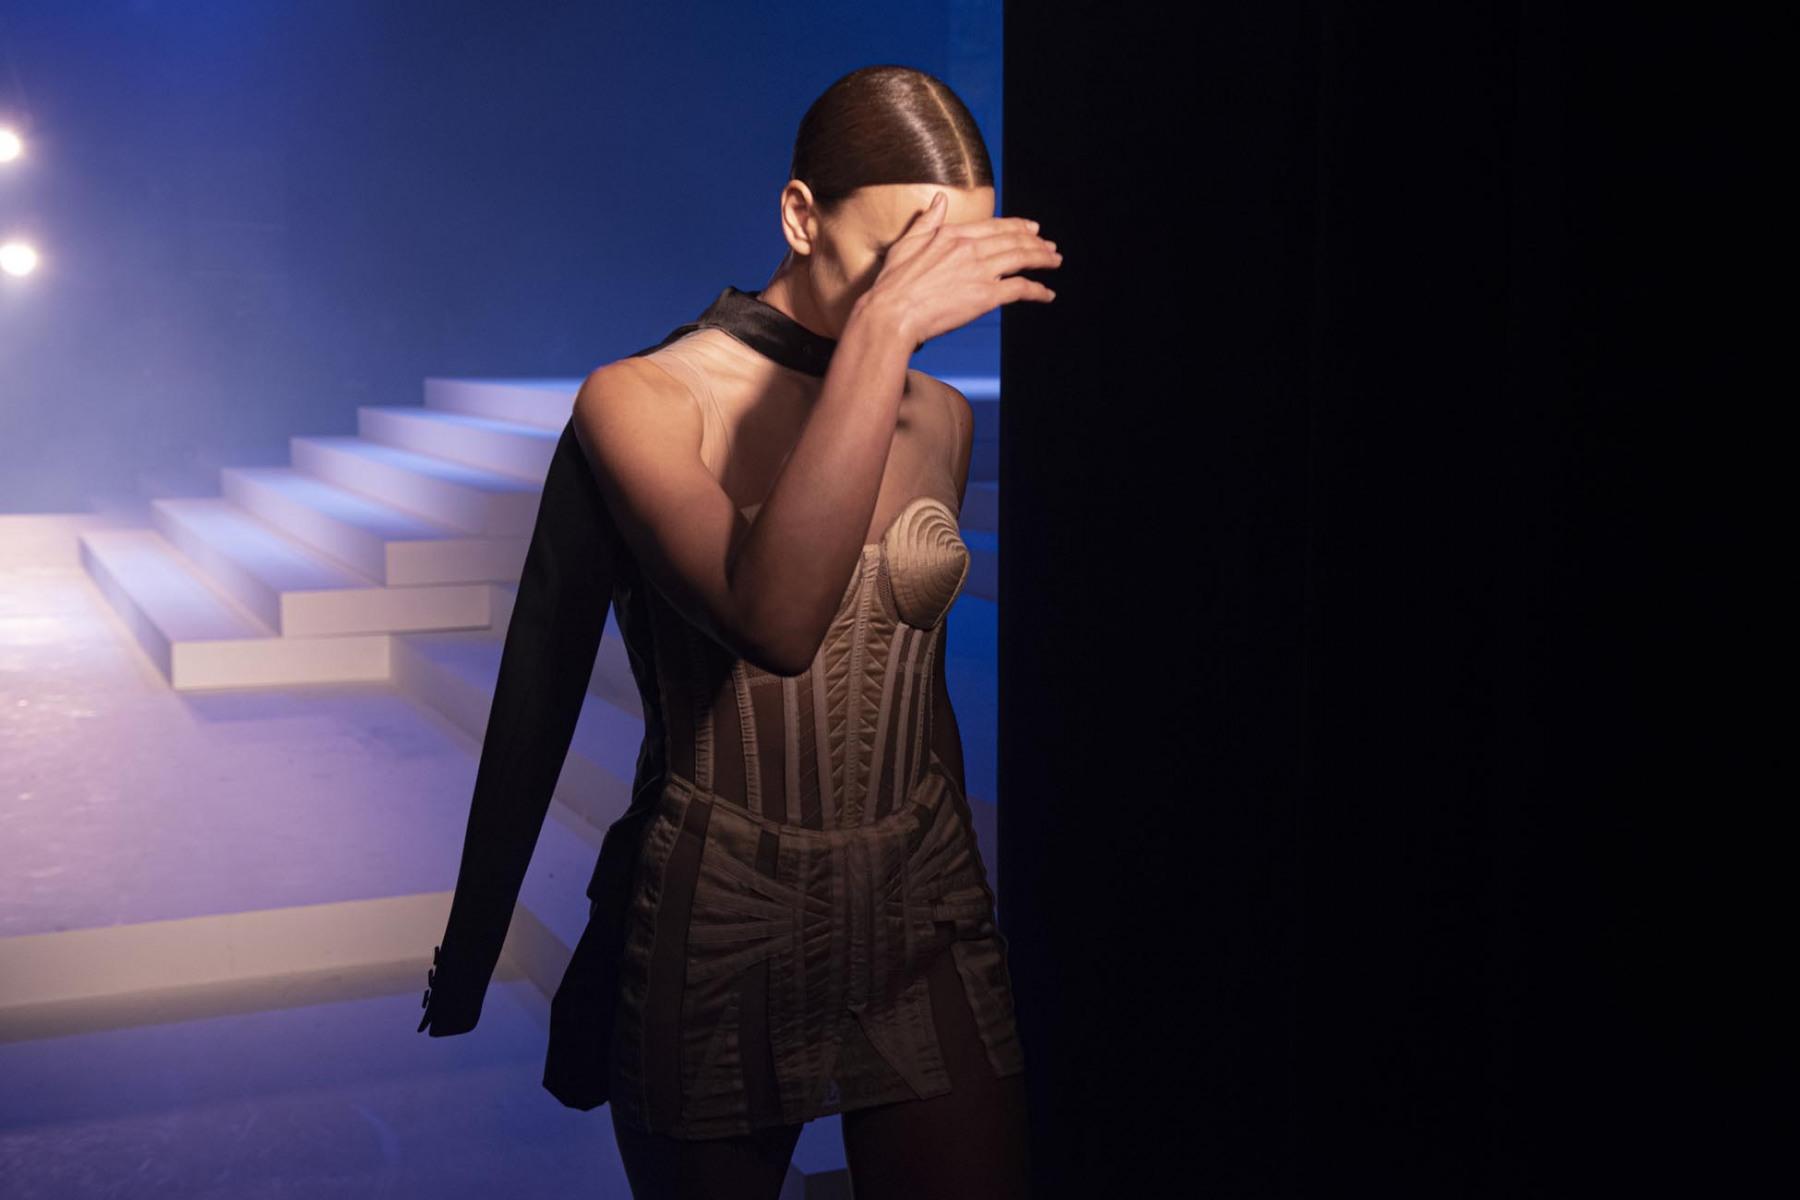 Jean-Paul-Gaultier-Haute-couture-Ete-2020-9